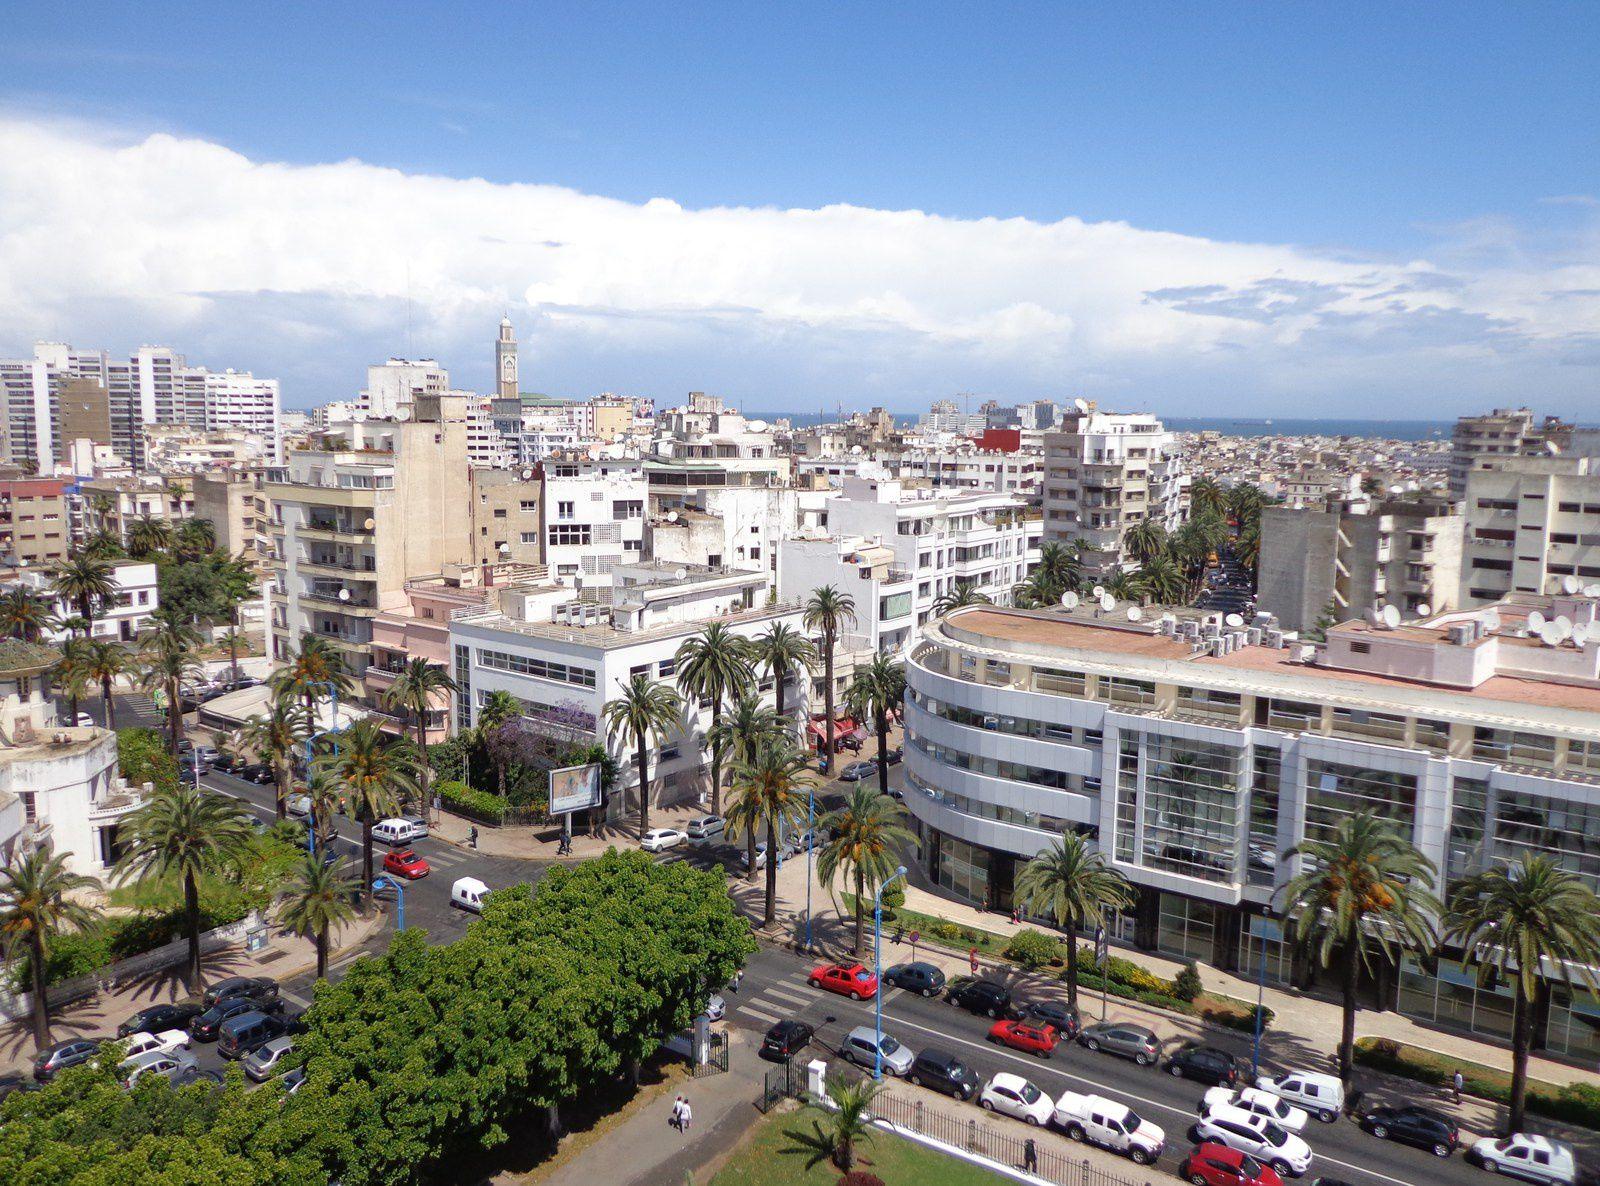 Casablanca voyages au poing